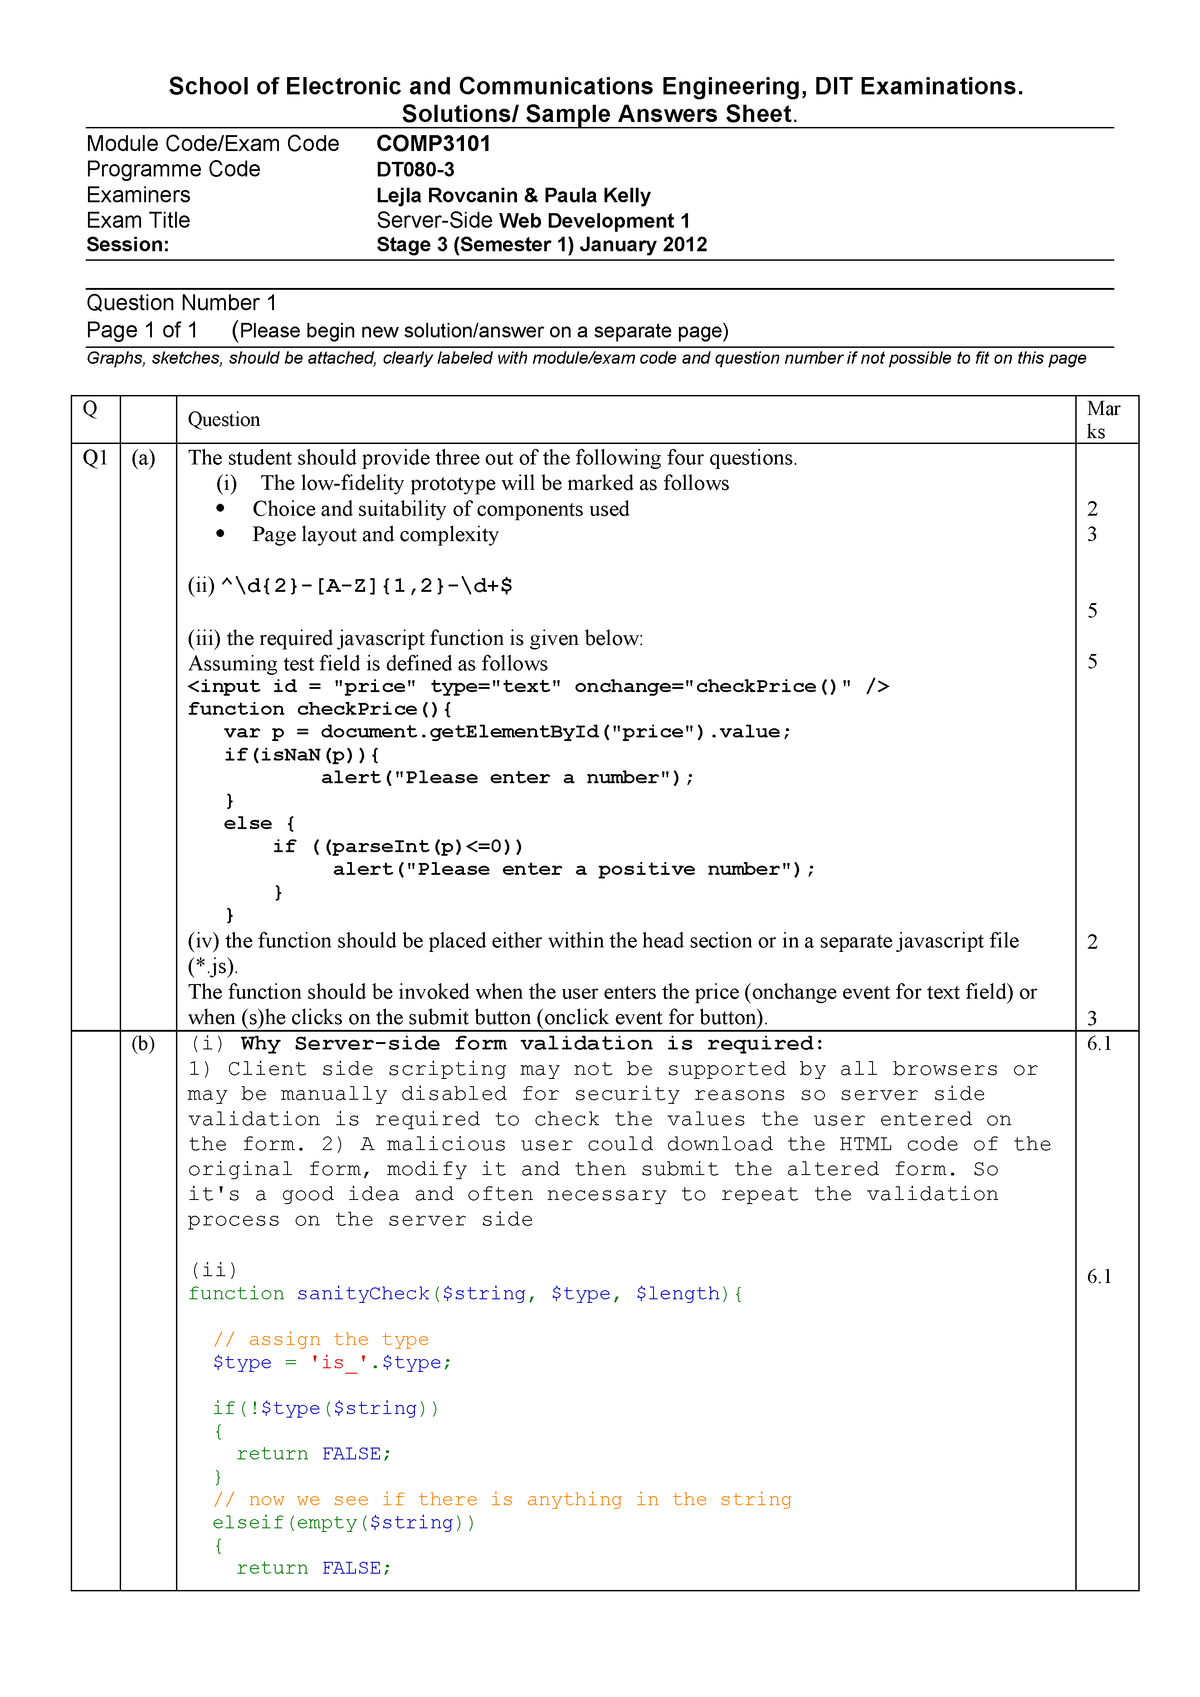 Exam 2011 - COMP3101: Server-side Web Development - StuDocu